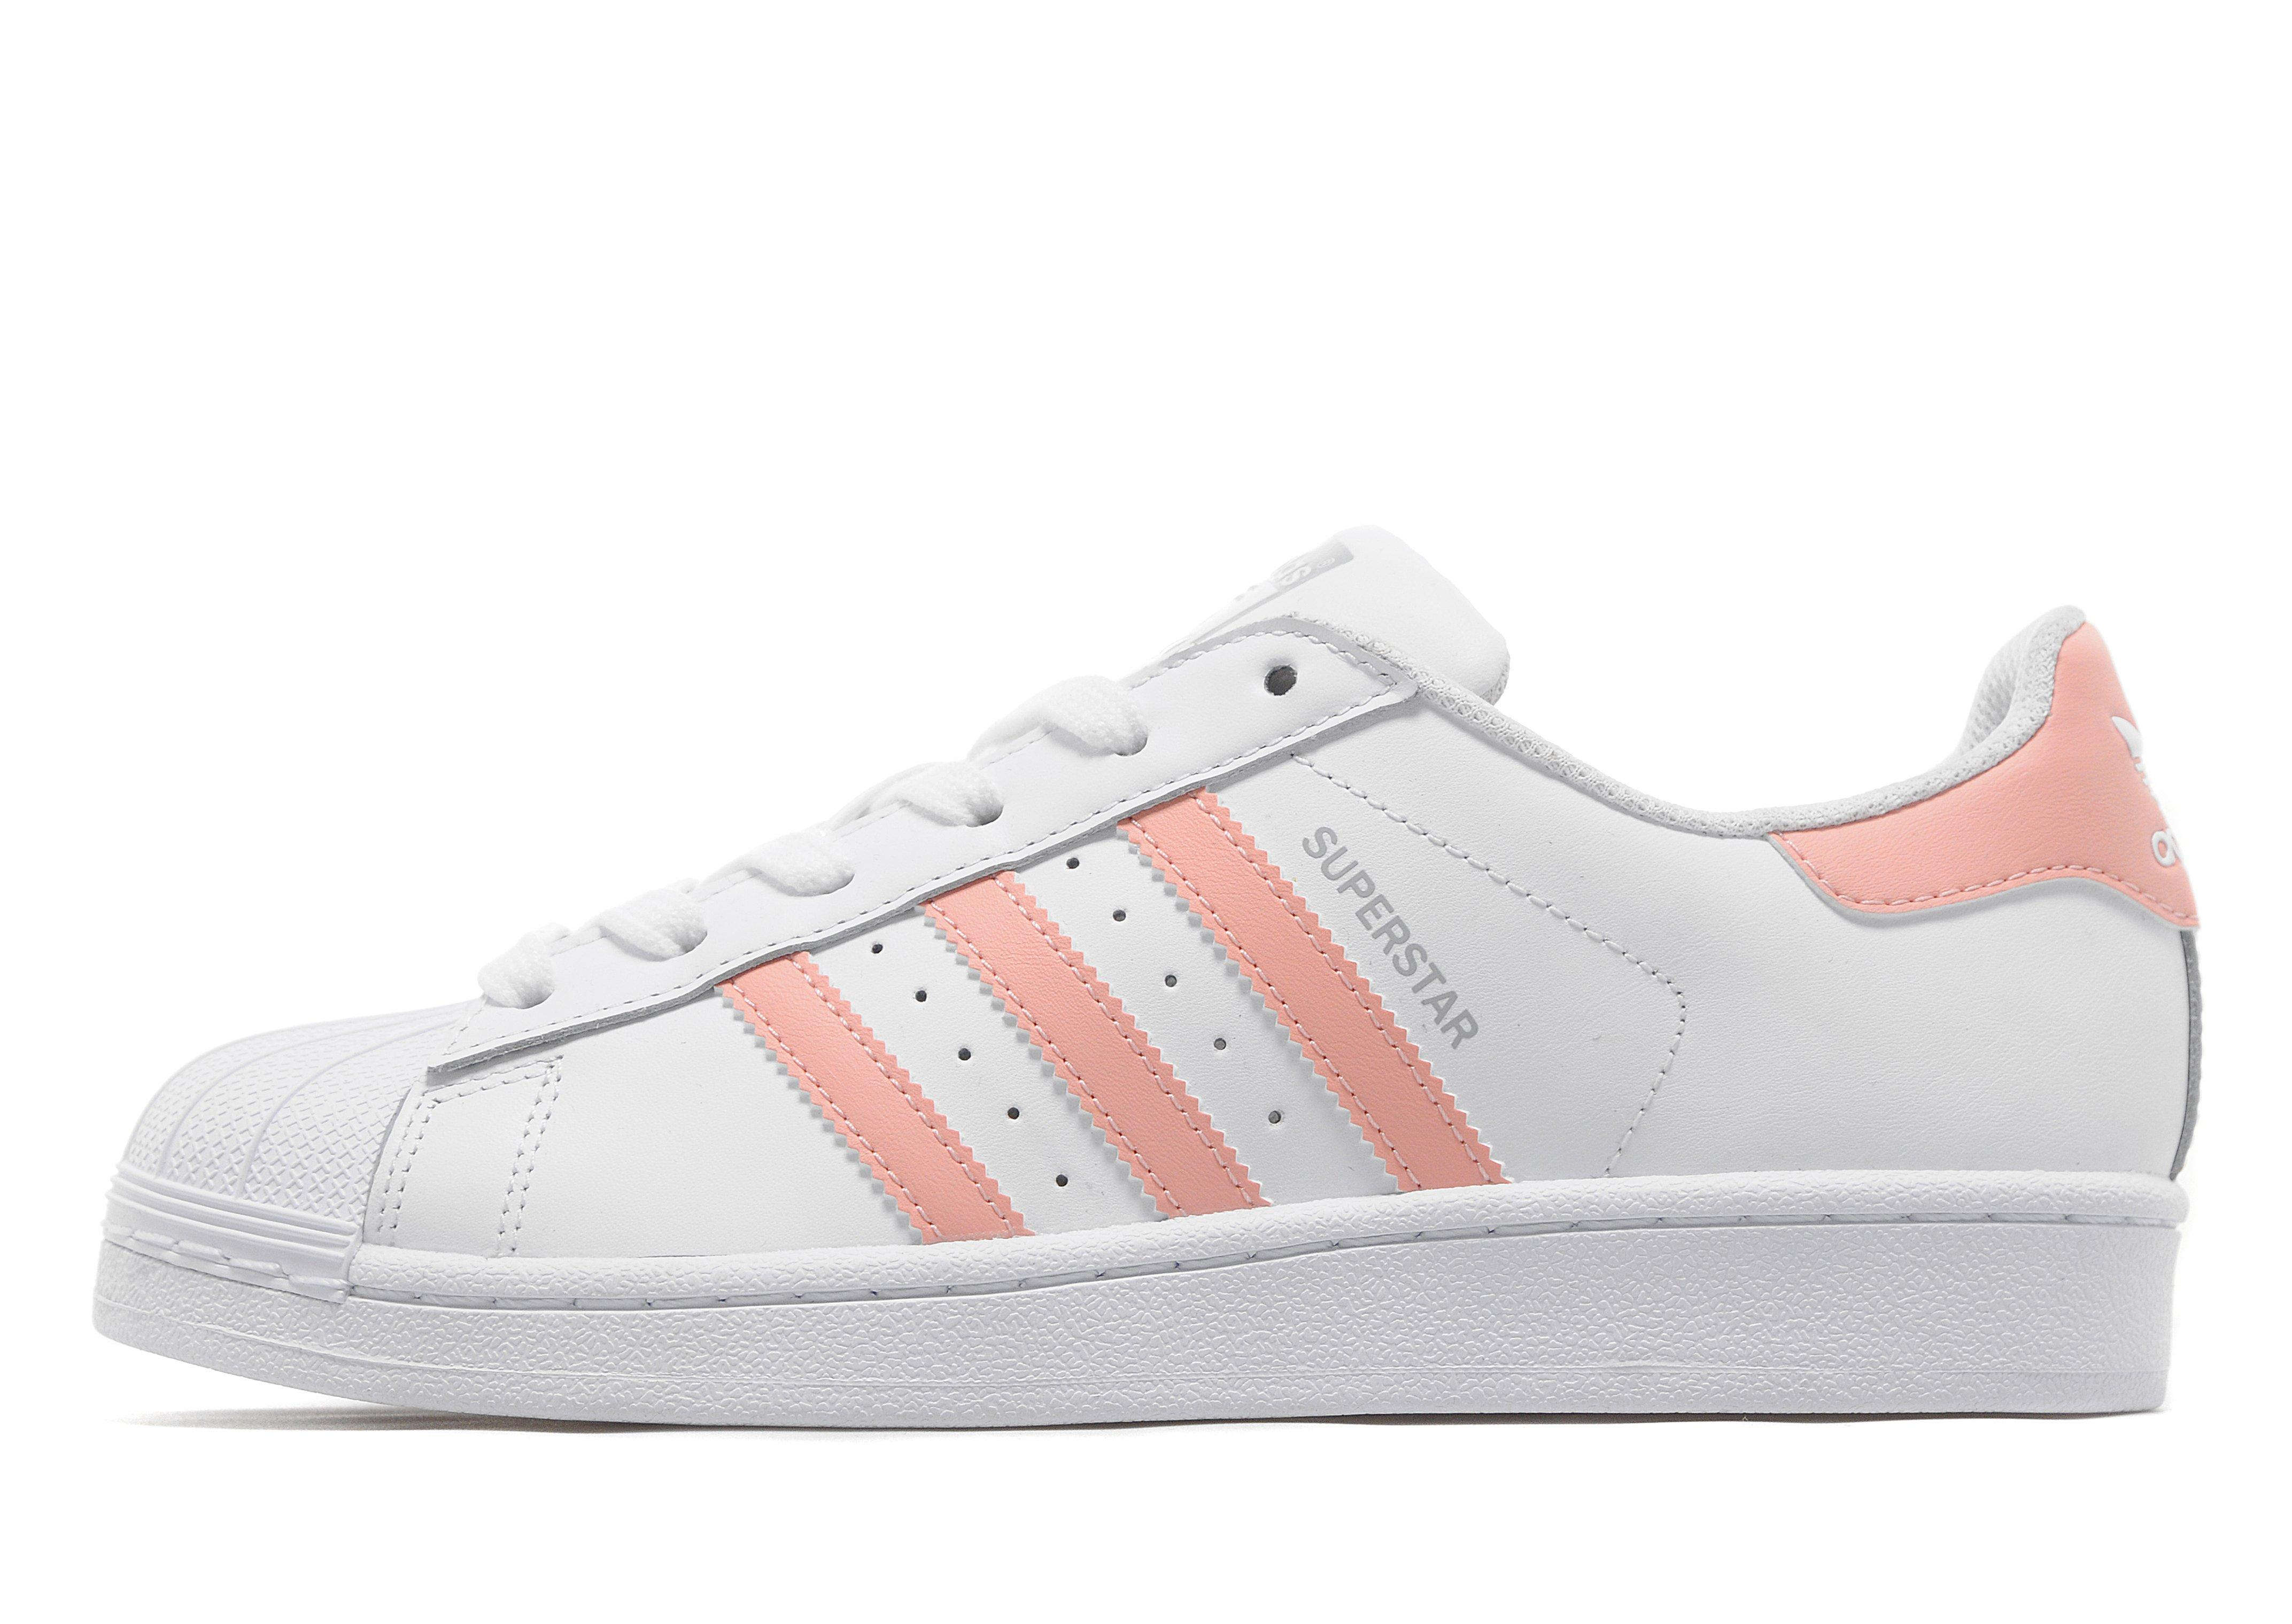 adidas 11 club shin guards adidas superstar pink stripe